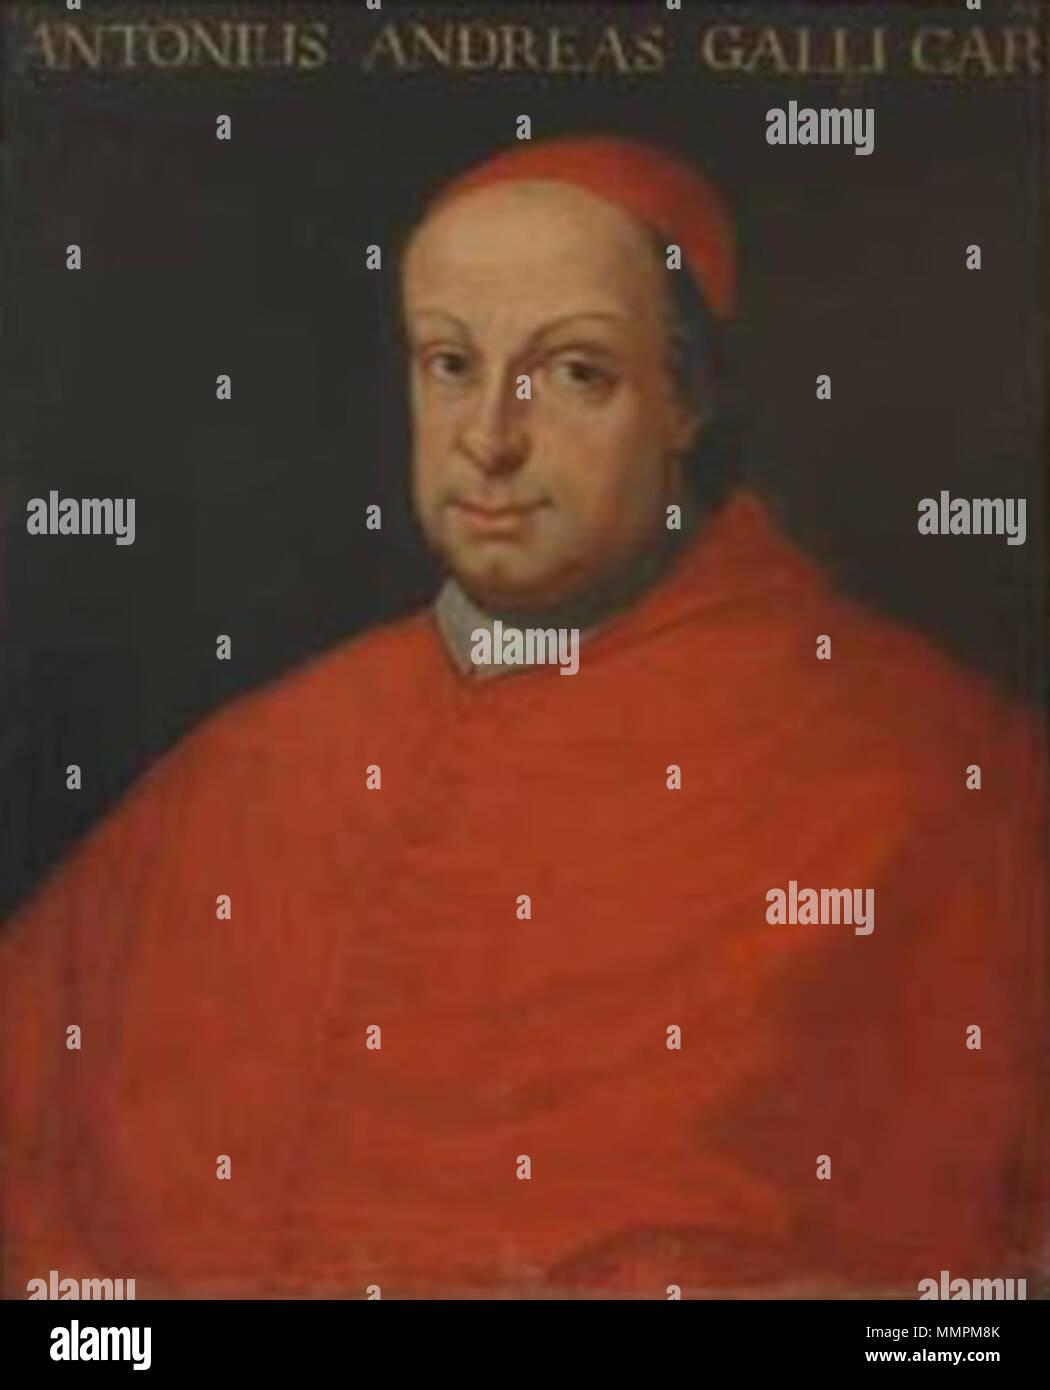 . English: Antonio Andrea Galli, cardinal of the Roman Catholic Church  277 R Galli Antonio Andrea.TIF CAMERA       : E990V1.1 METERING     : MATRIX MODE         : A SHUTTER      : 1/1sec APERTURE     : F6.4 EXP +/-      : -1.7 FOCAL LENGTH : f15.6mm(X1.0) IMG ADJUST   : AUTO SENSITIVITY  : ISO100 WHITEBAL     : AUTO SHARPNESS    : AUTO DATE         : 03.07.2002 09:01 QUALITY      : FULL HI Antonio Andrea Galli - Stock Image